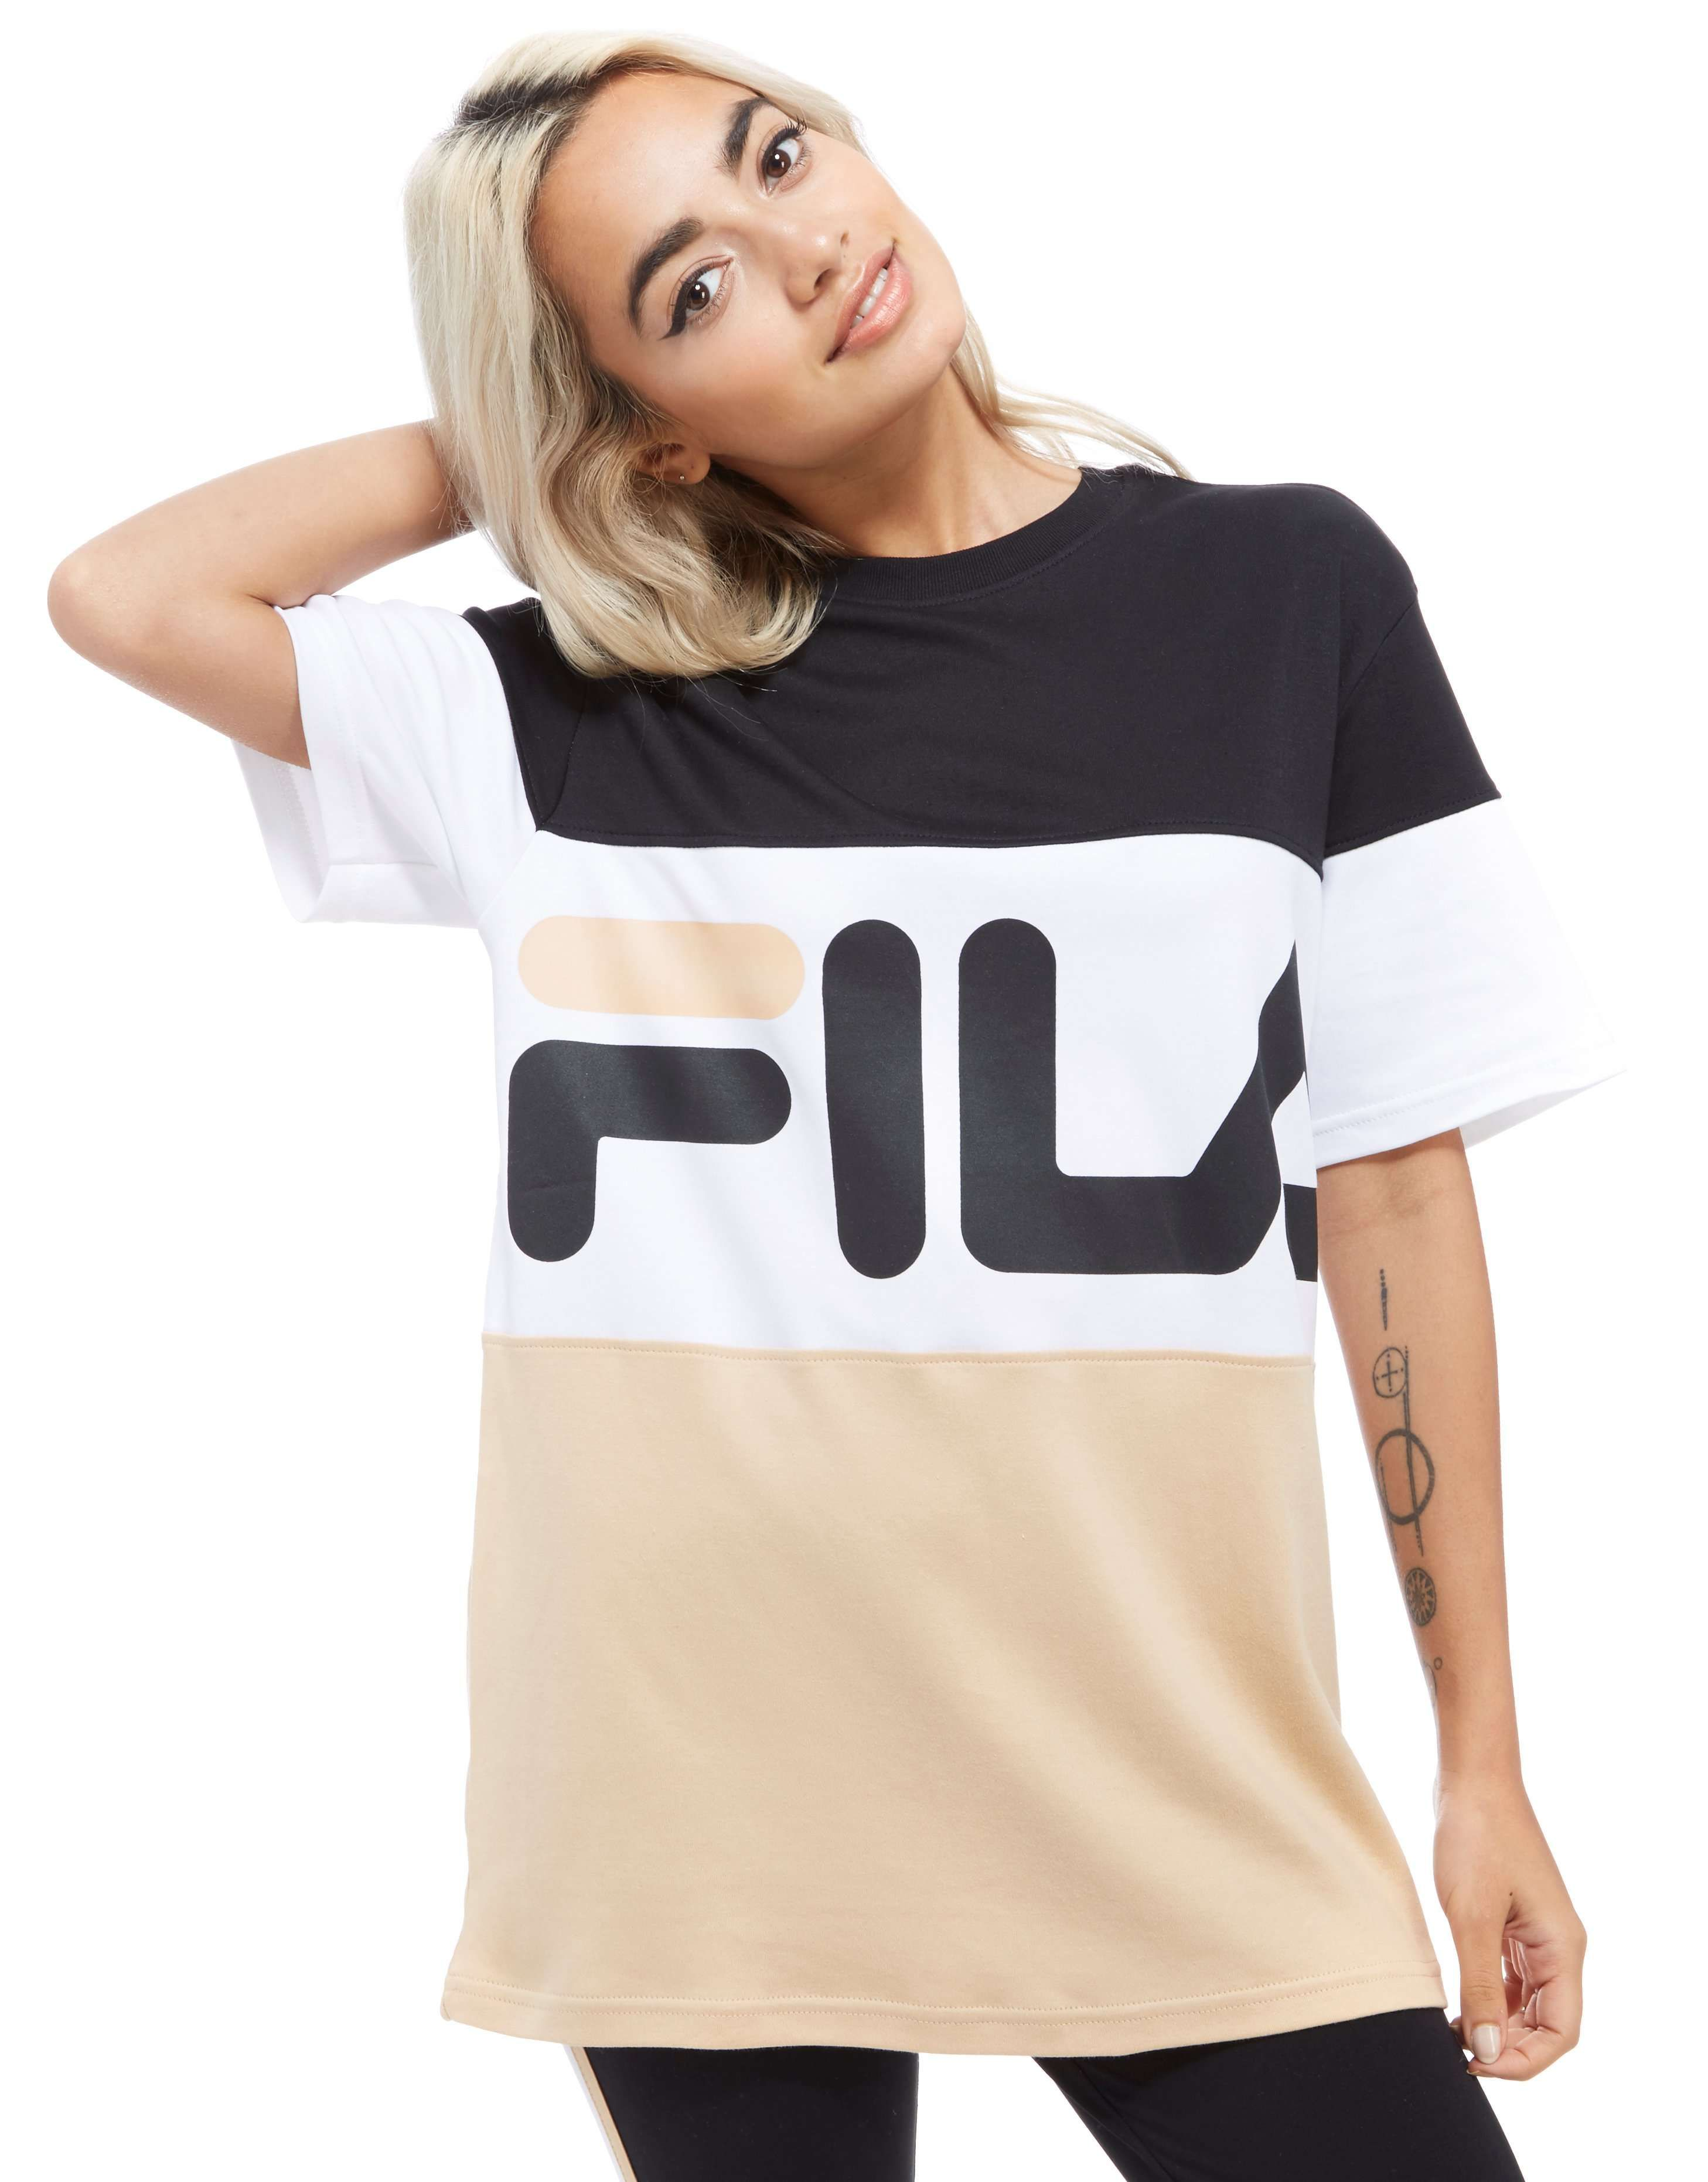 e3f83590f Fila Boyfriend Style T-Shirt - Shop online for Fila Boyfriend Style T-Shirt